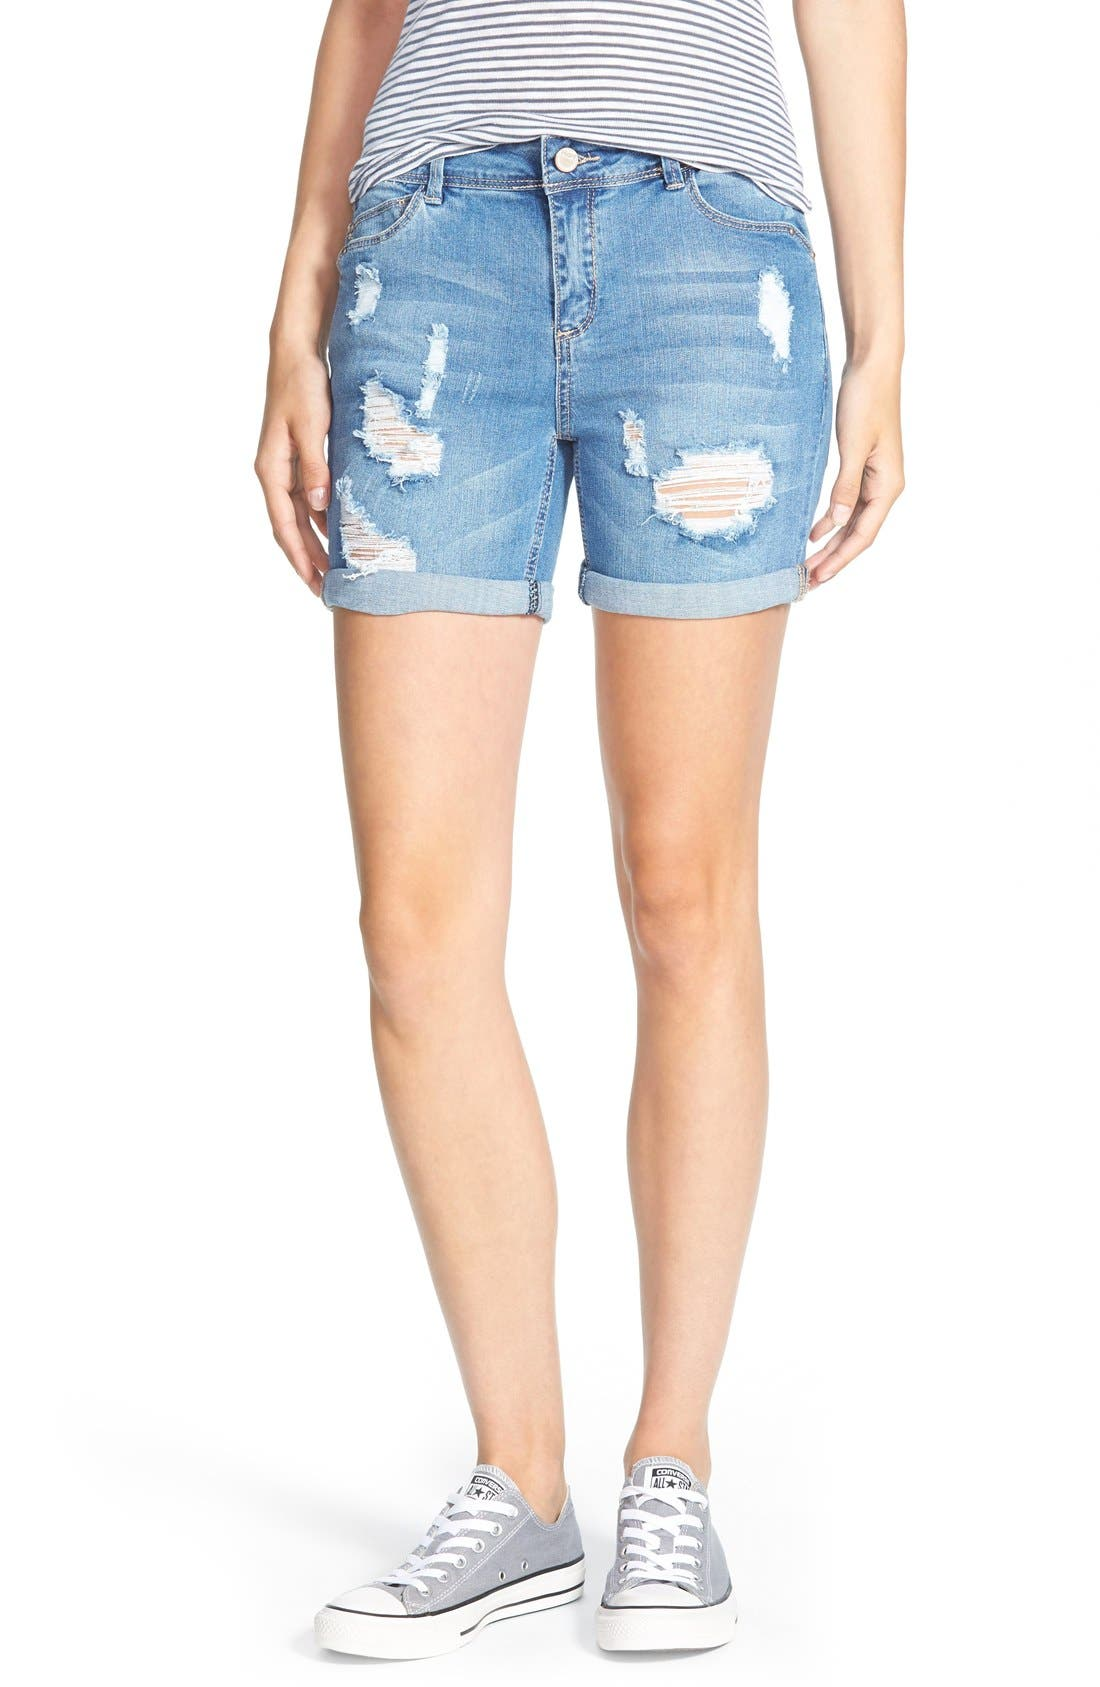 Alternate Image 1 Selected - HART Denim 'Nixie' Cuffed Denim Shorts (Light Stone)